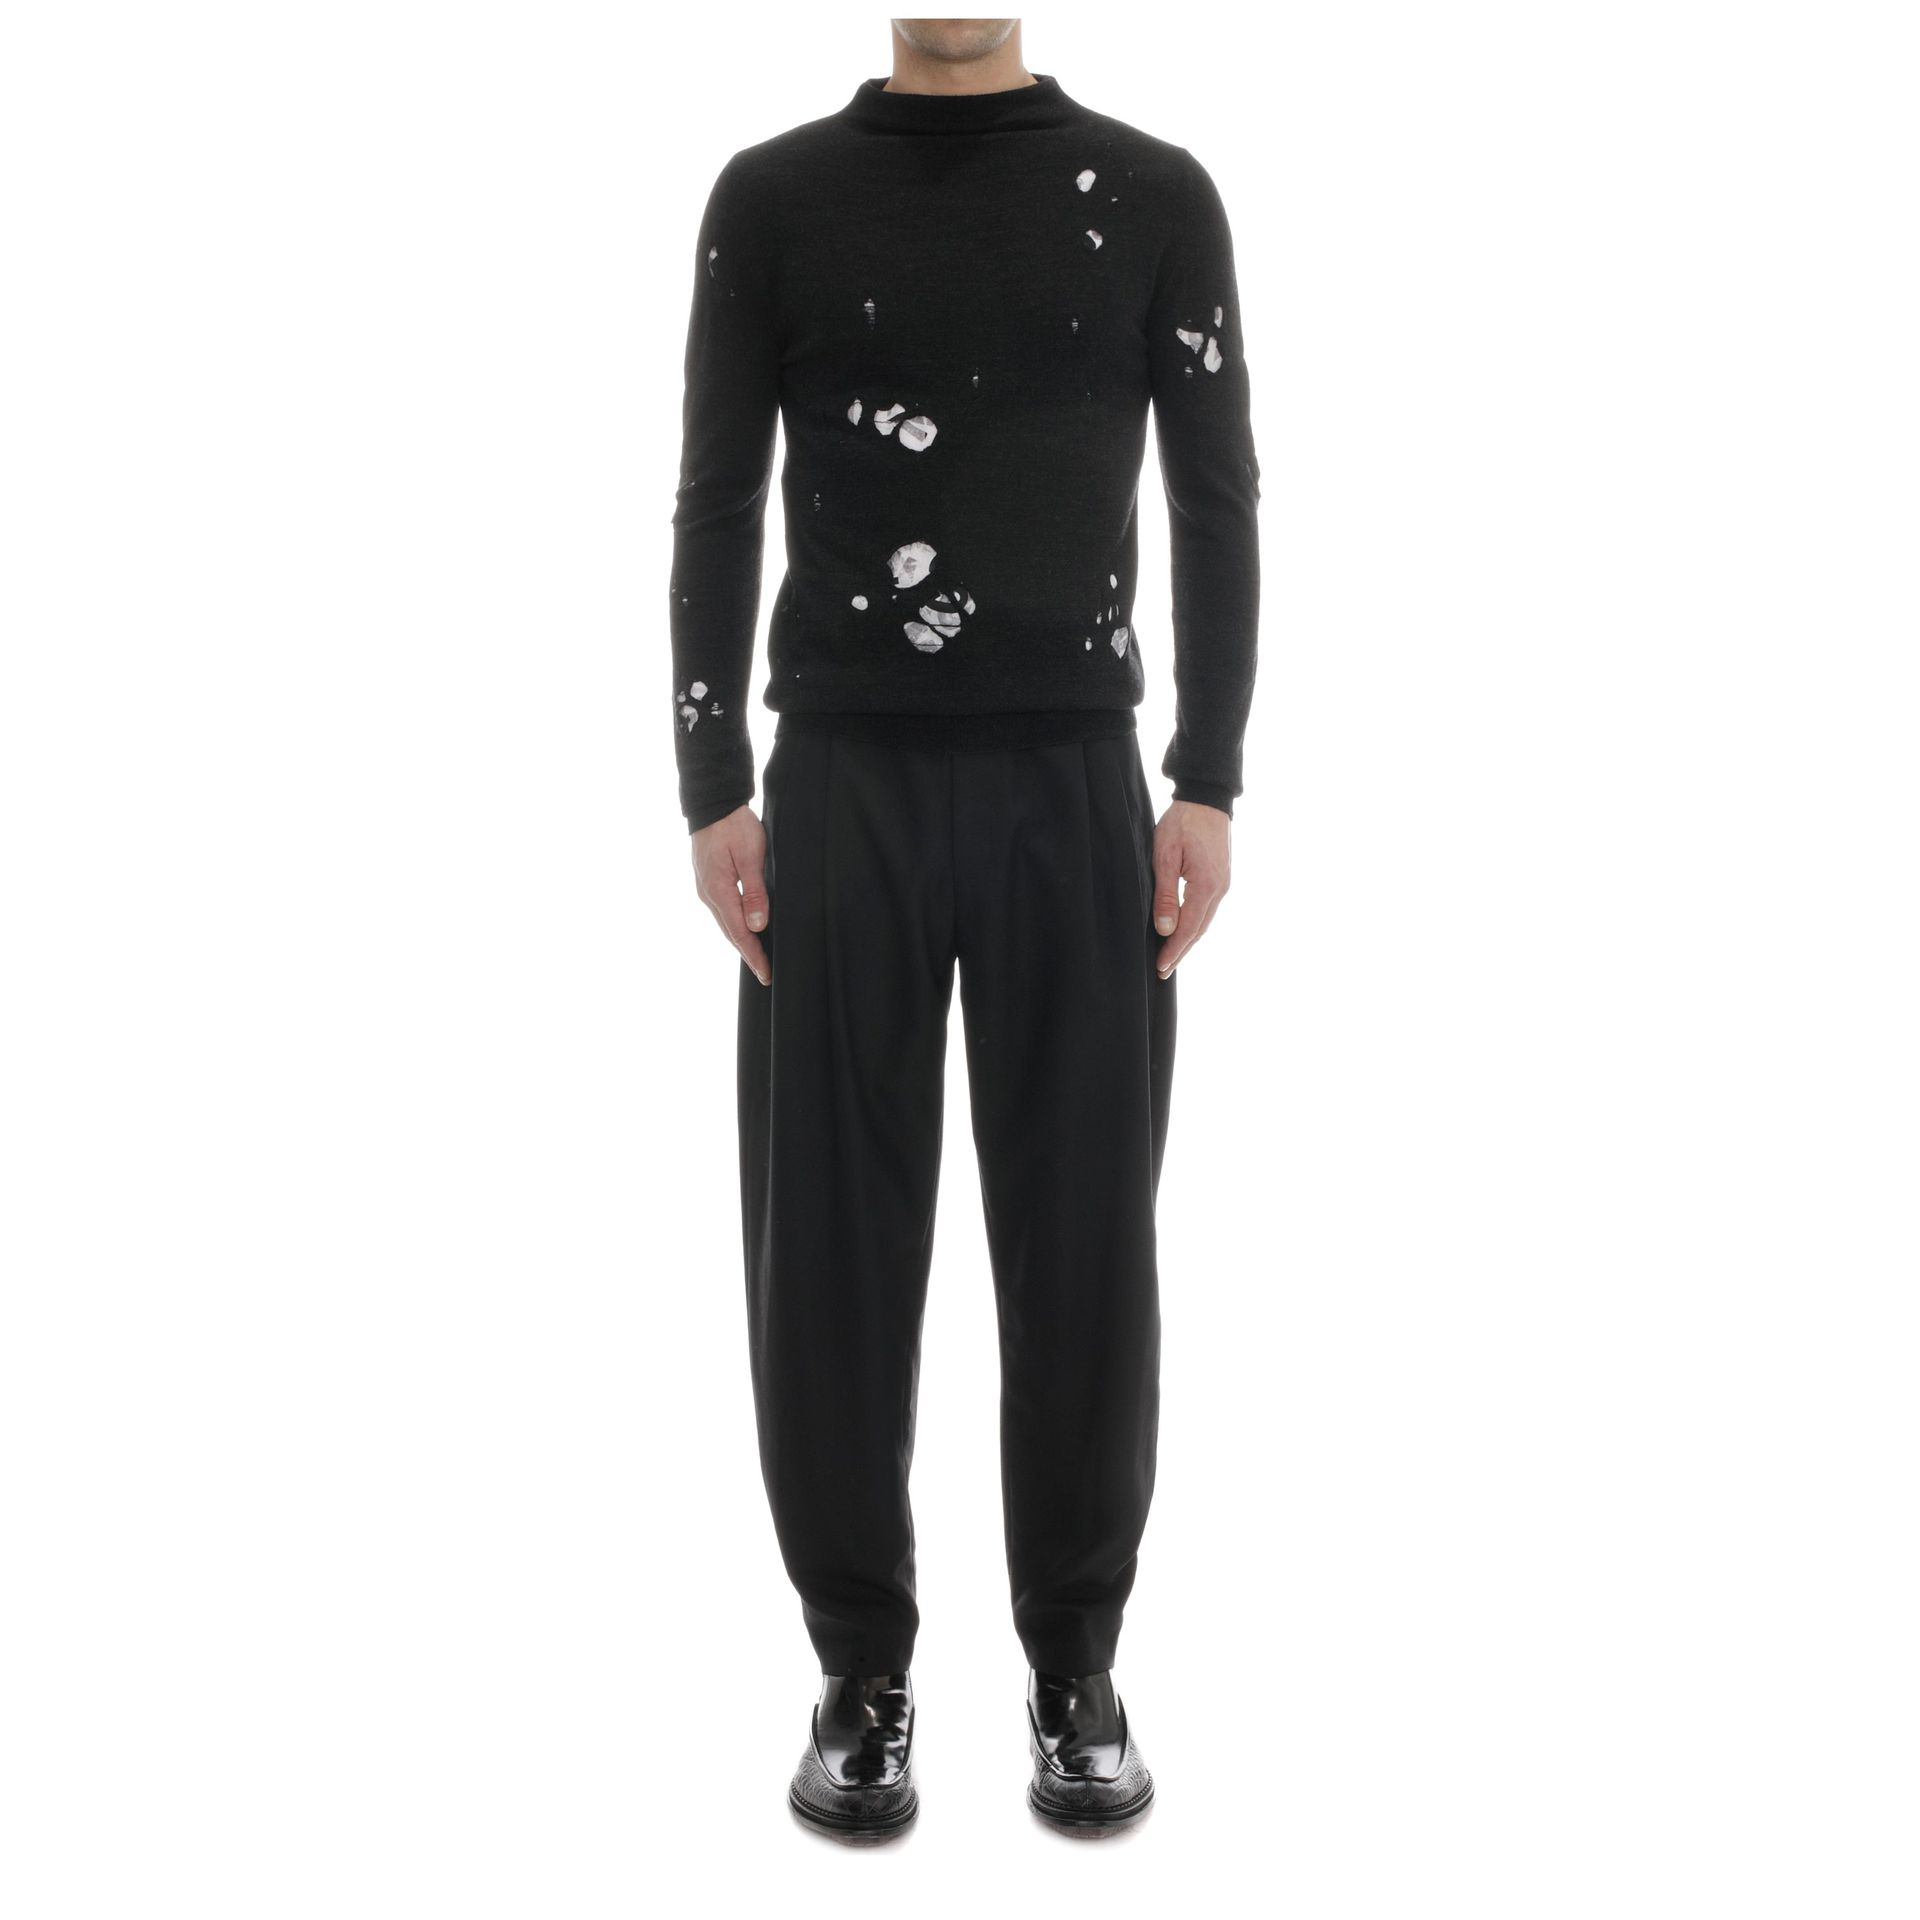 de74aee8c37c9 Lyst - McQ Three Pleat Trousers in Gray for Men